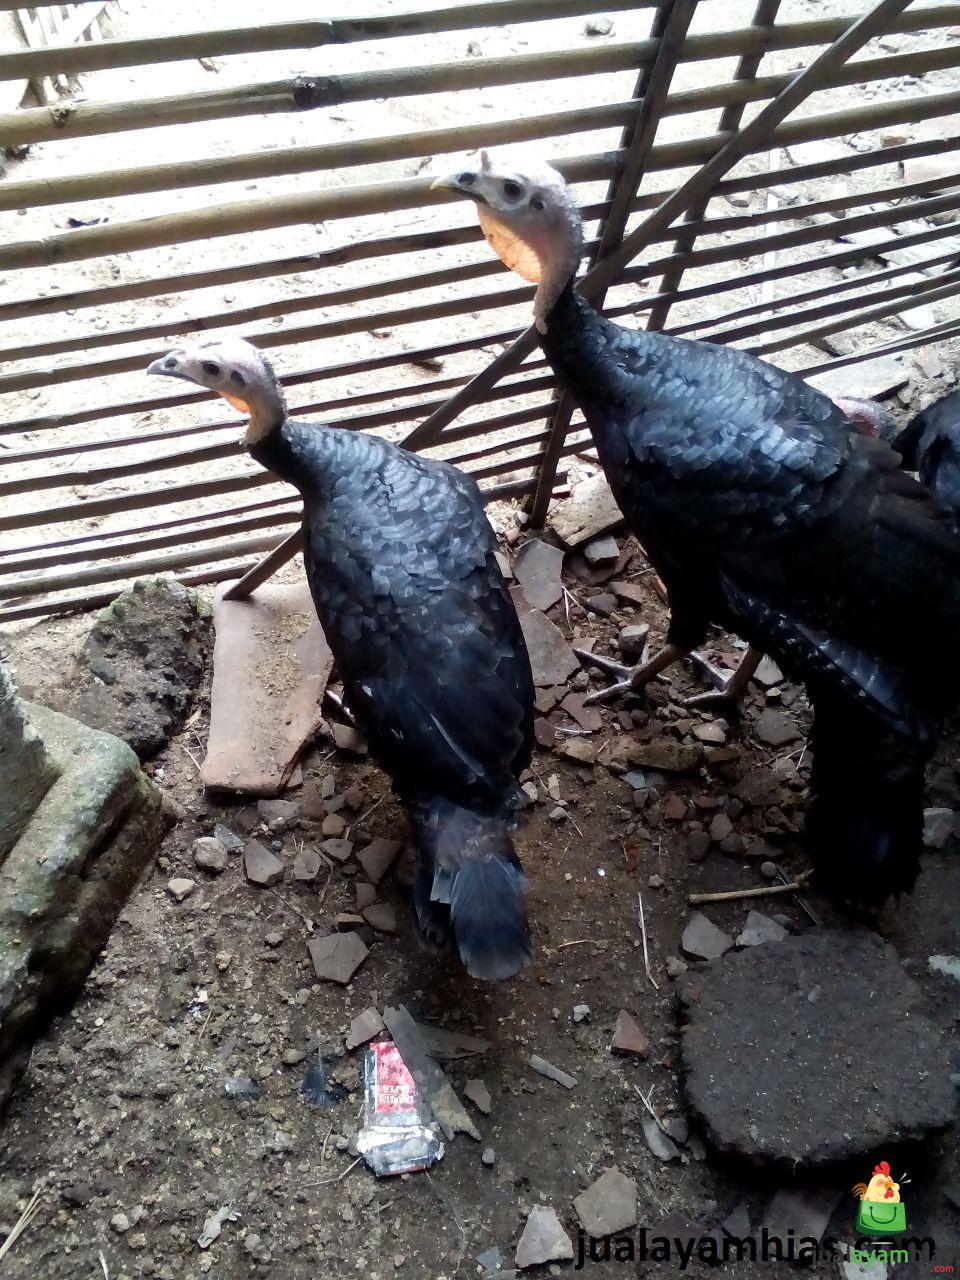 Ayam Kalkun Black Spanish Umur 5 Bulan Mengenal Asal Mula Ayam Kalkun Black Spanish Jual Ayam Hias HP : 08564 77 23 888 | BERKUALITAS DAN TERPERCAYA Mengenal Asal Mula Ayam Kalkun Black Spanish Mengenal Asal Mula Ayam Kalkun Black Spanish Serta Tata Cara Pemeliharaan Ayam Kalkun yang Baik dan Benar